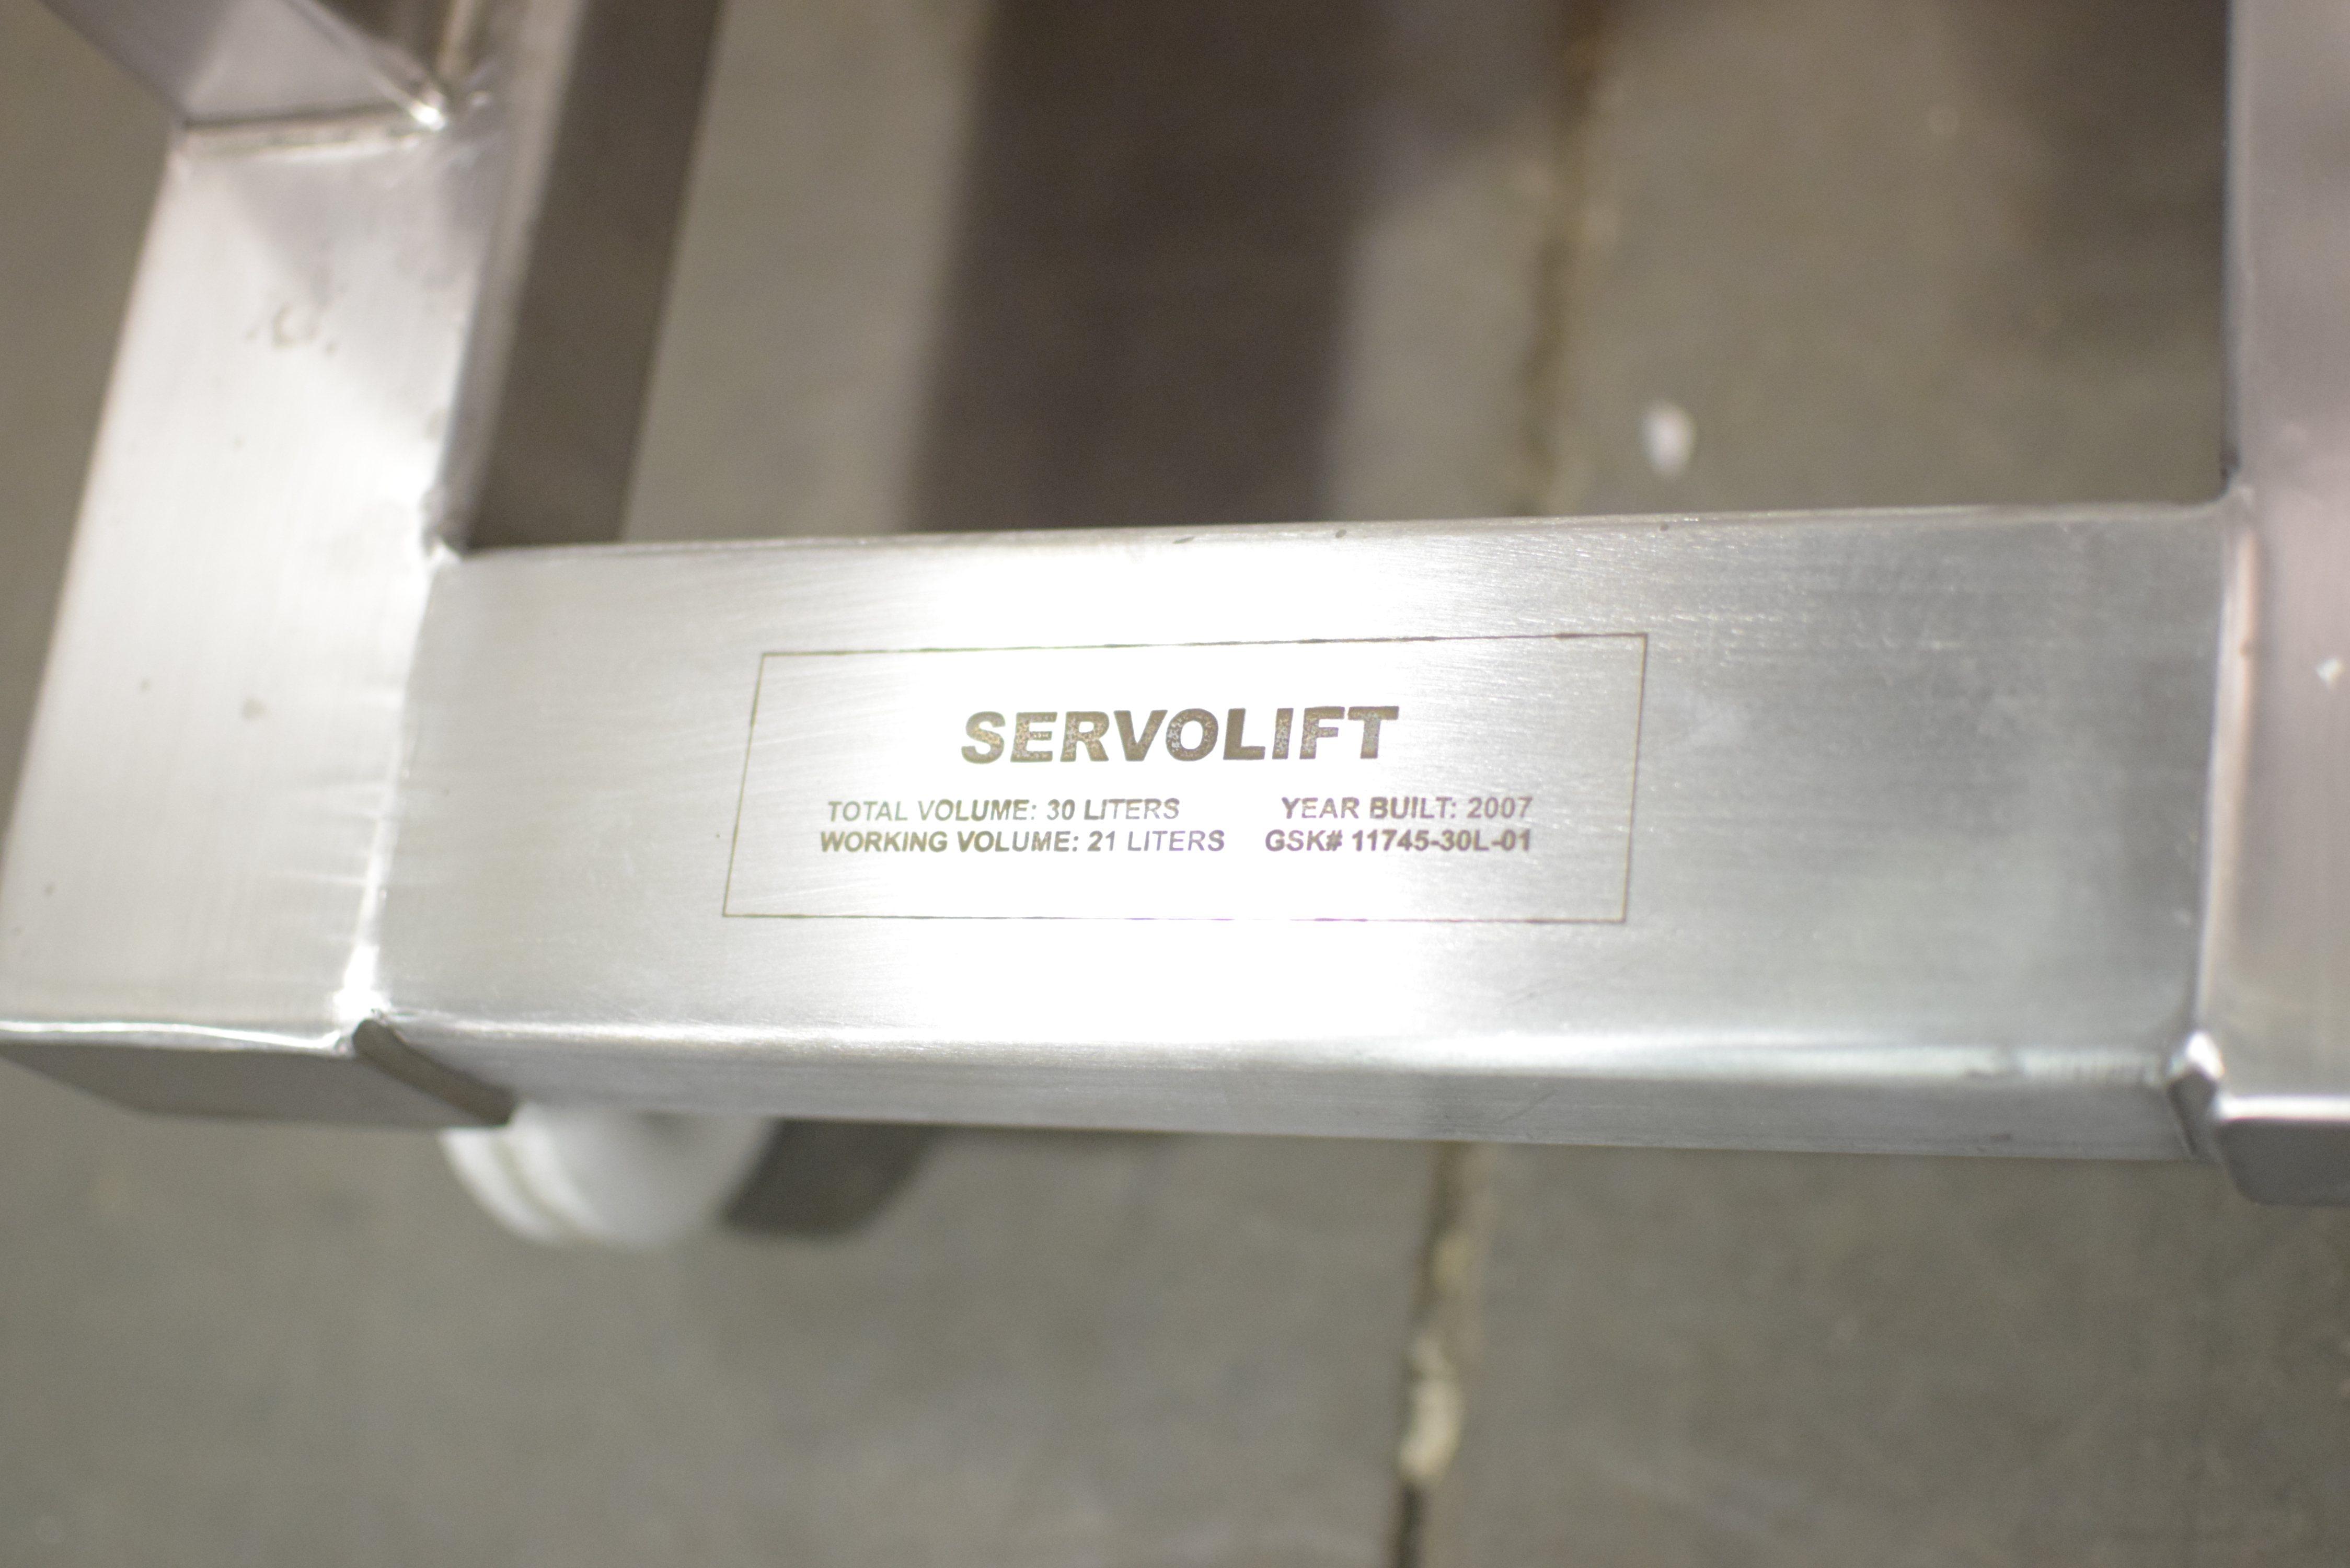 30 Liter Servolift stainless steel bin